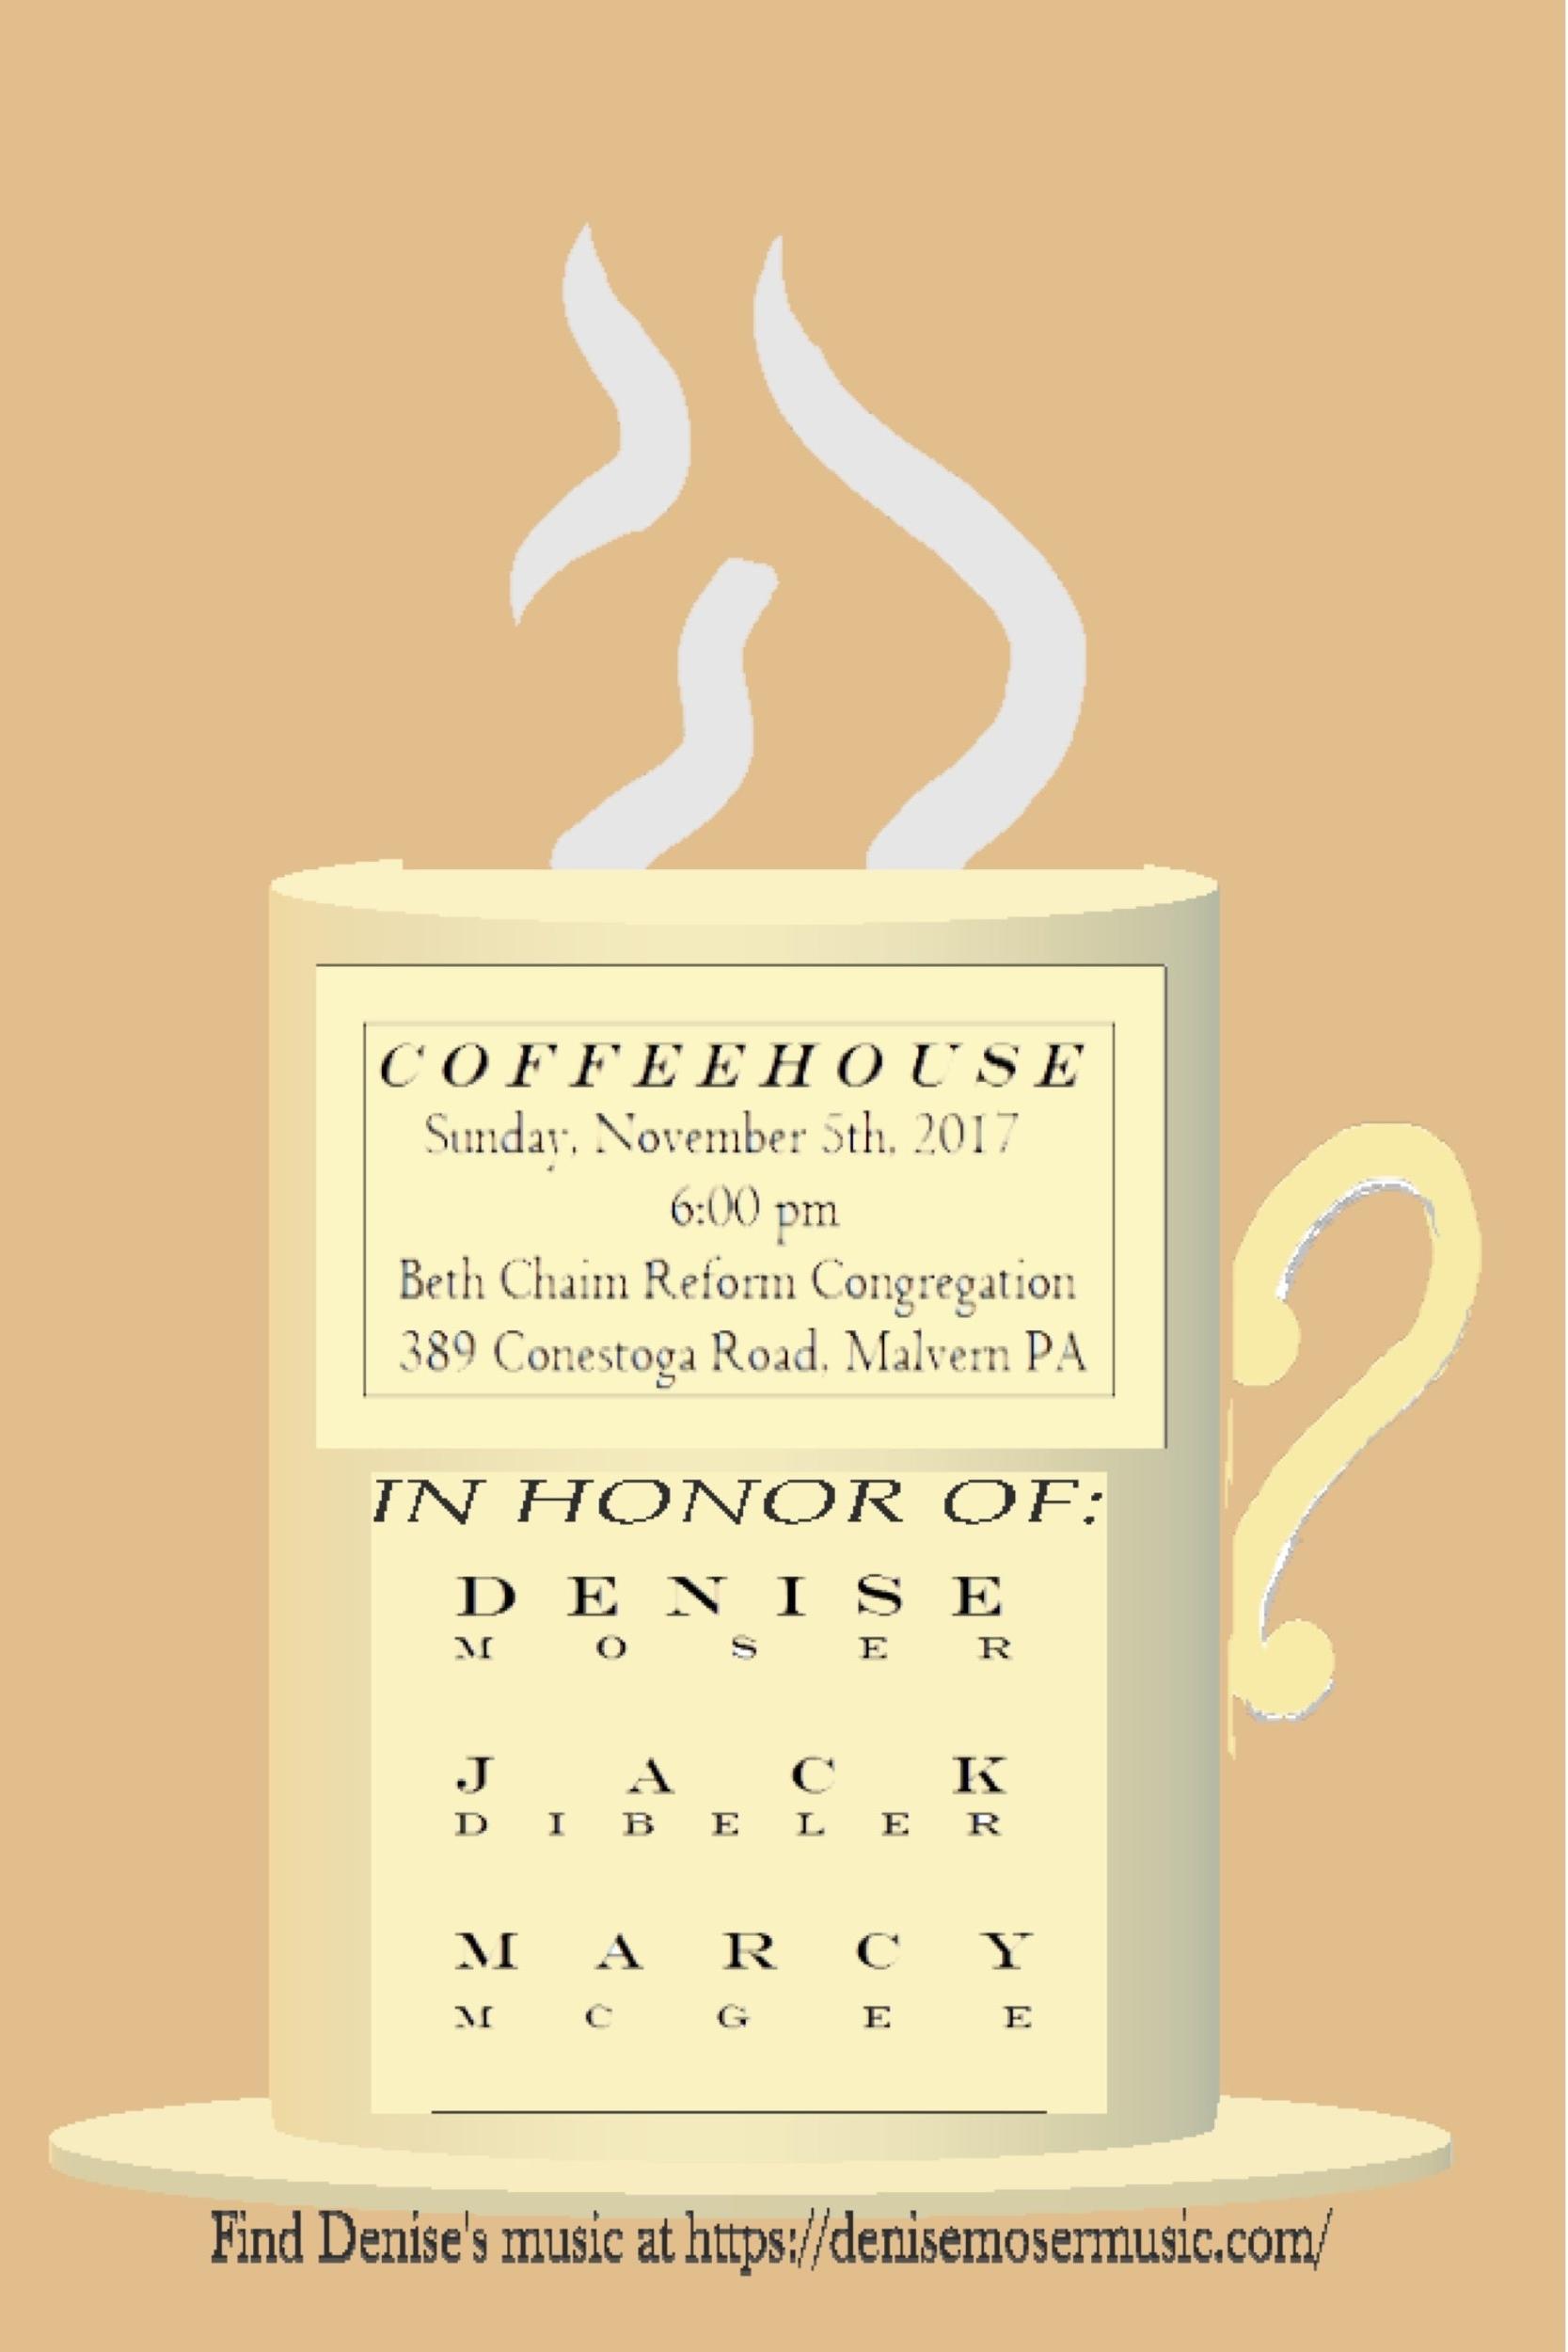 Coffeehouse Mailer 4x6 copy.jpg